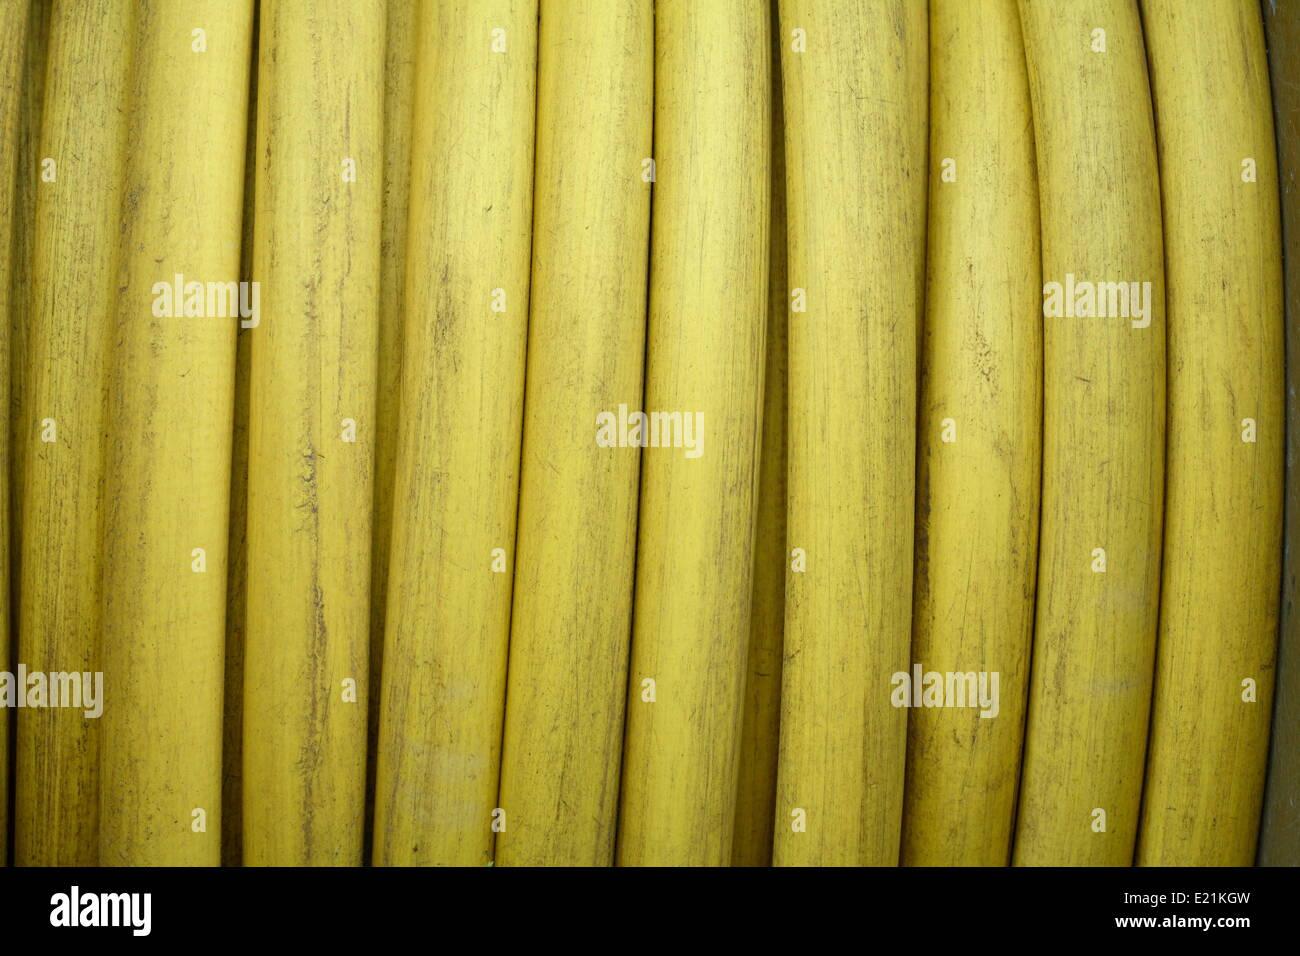 Garden hose - Stock Image